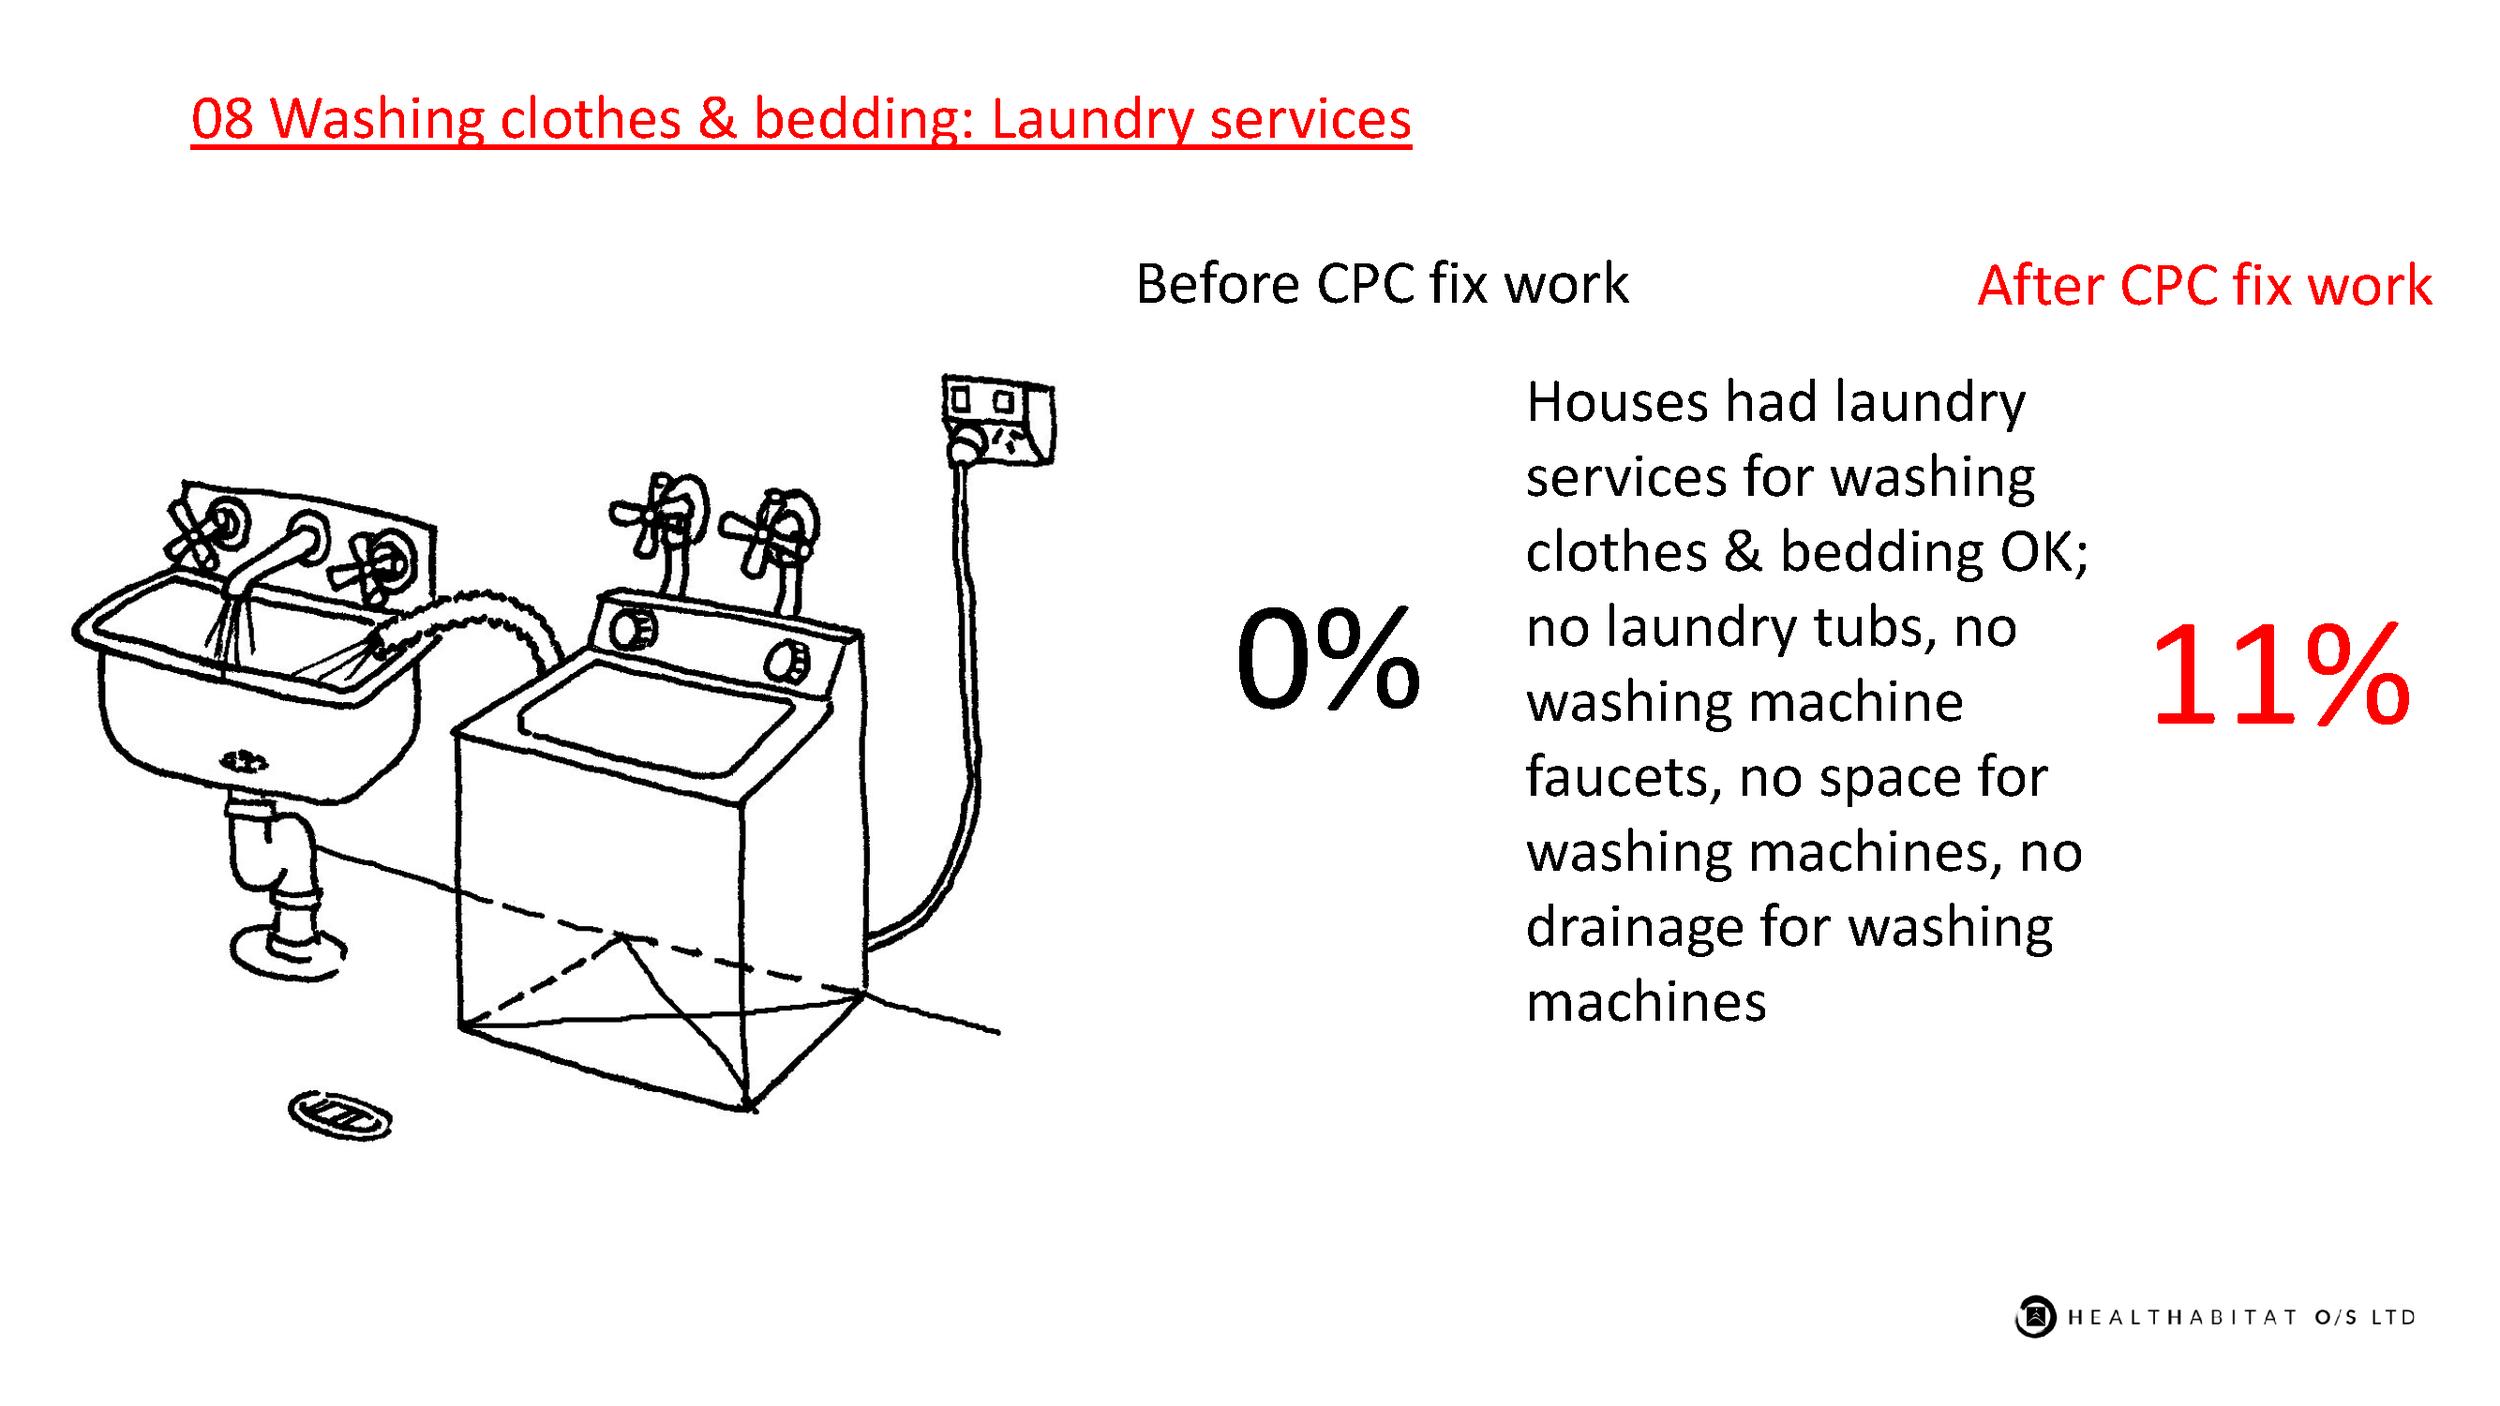 HFH-CPCNN-08-laundry.png